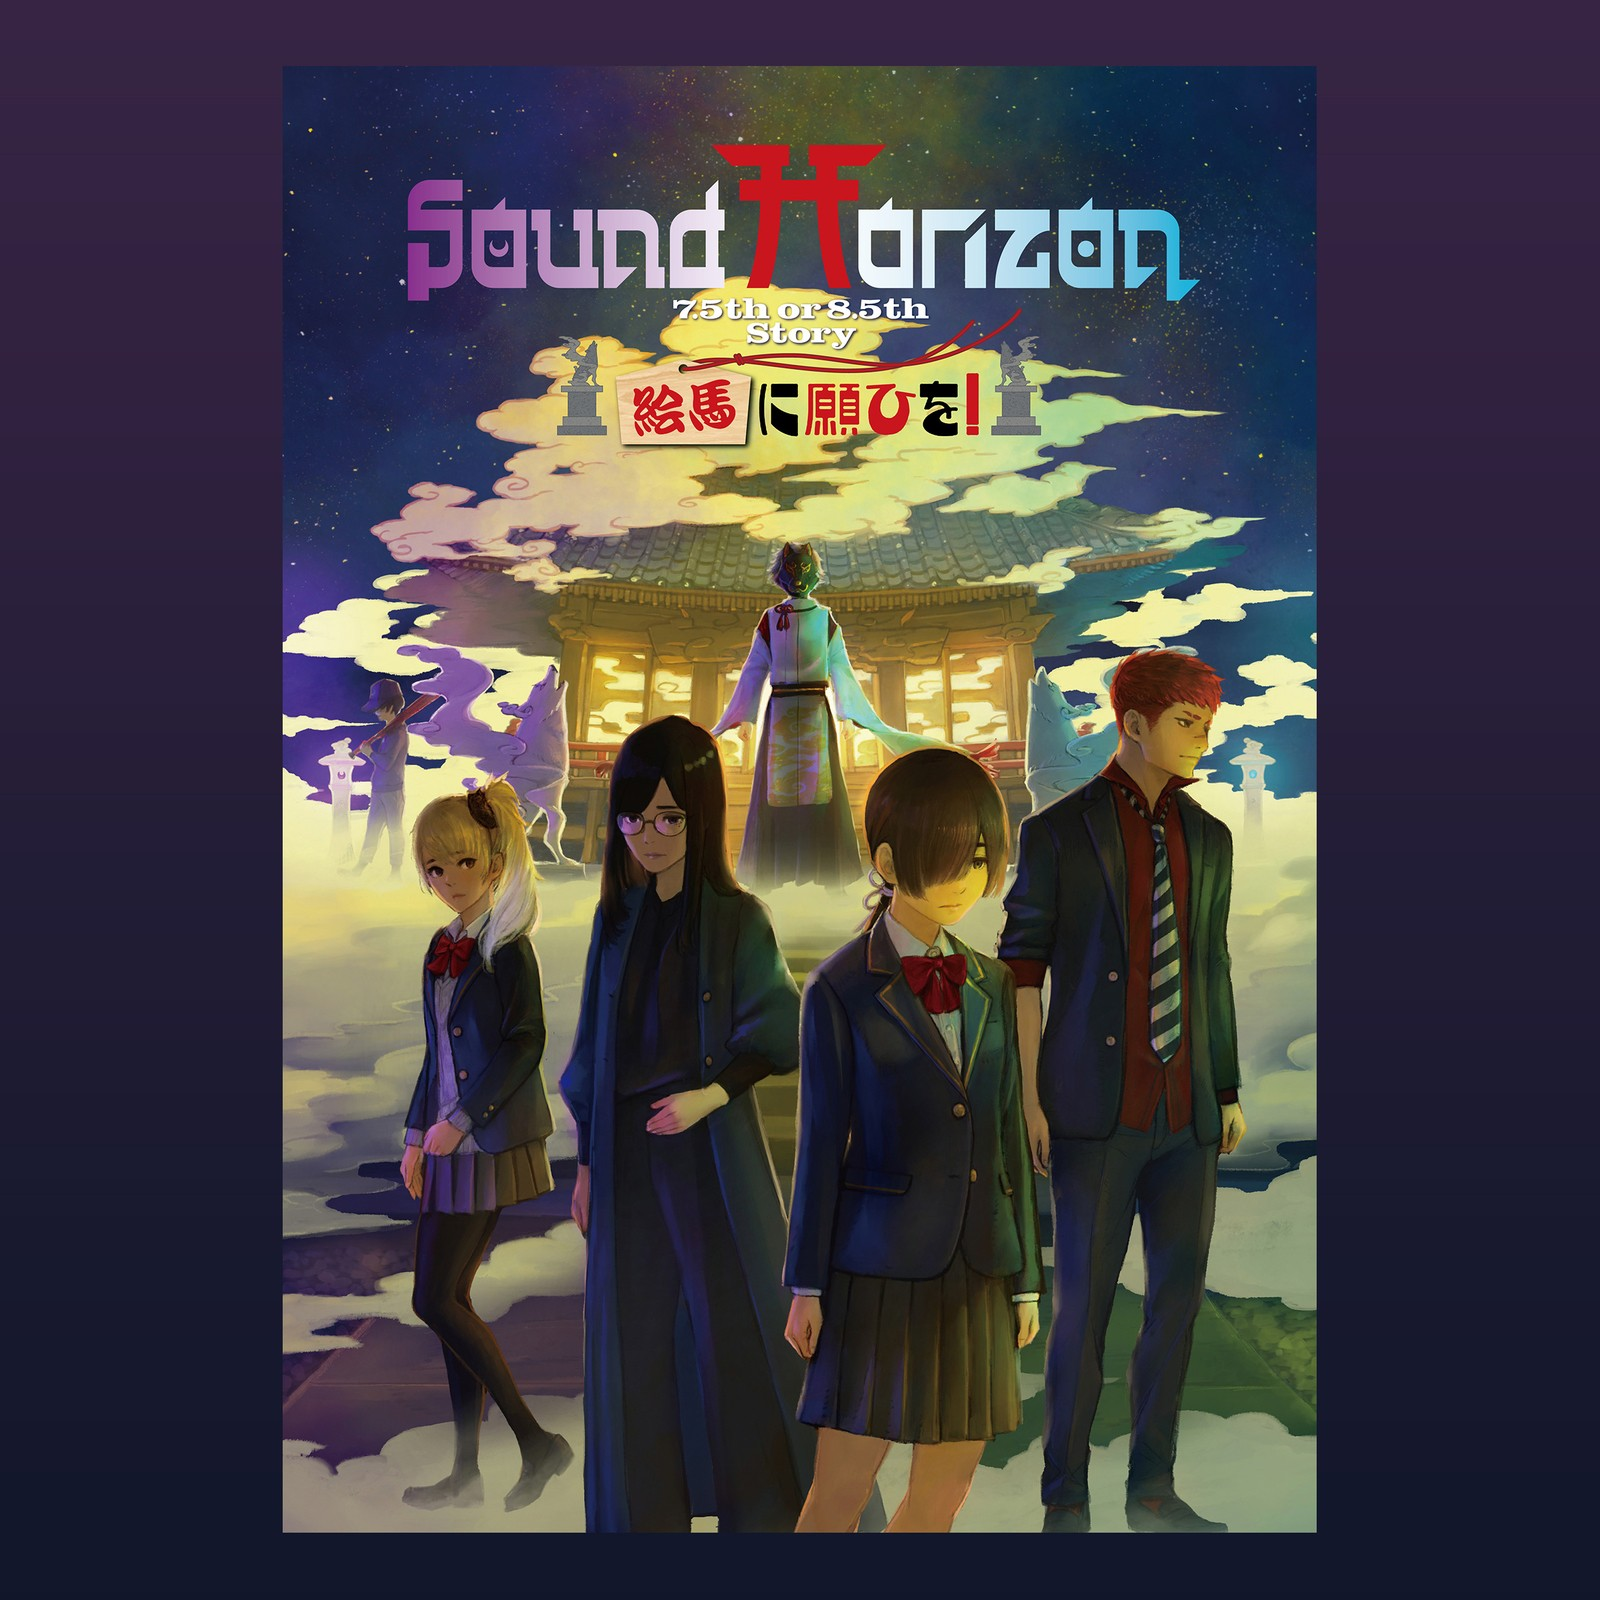 Sound Horizon (サウンドホライズン) – 絵馬に願ひを! (Prologue Edition) [24bit Lossless + MP3 320 / WEB] [2021.03.31]